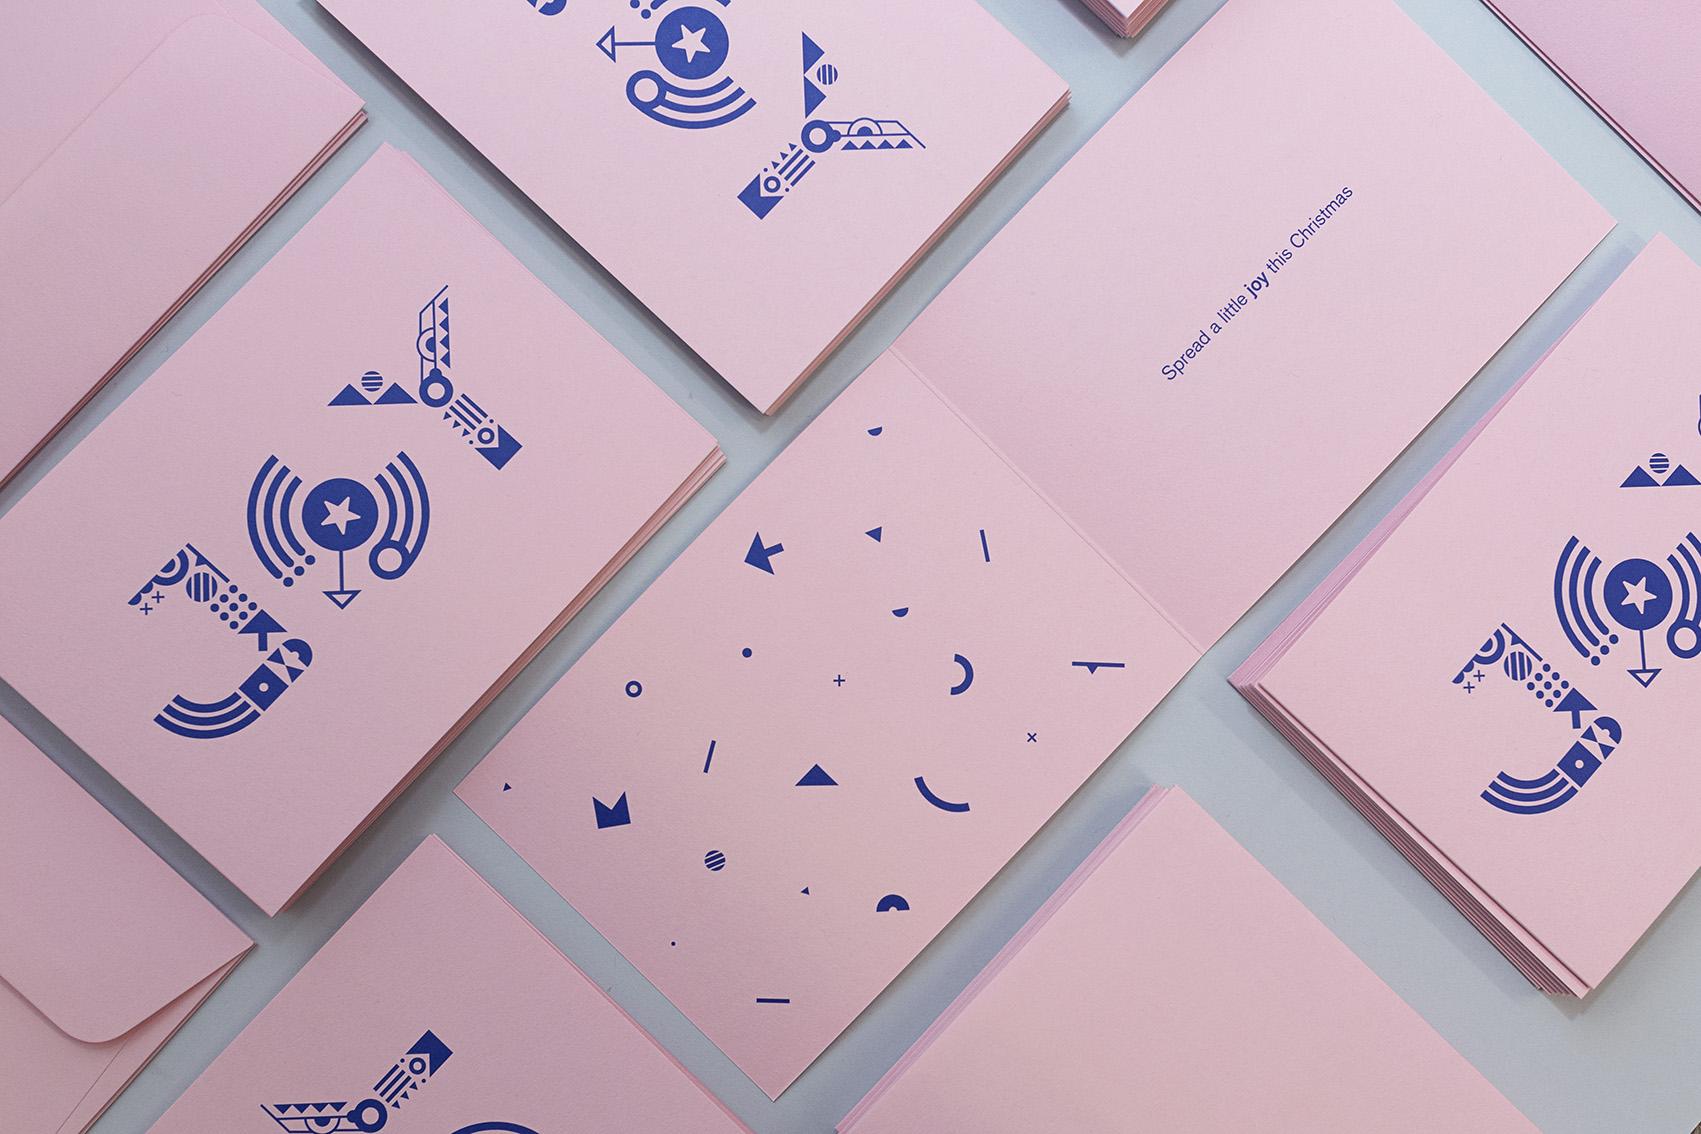 cards_5.jpg